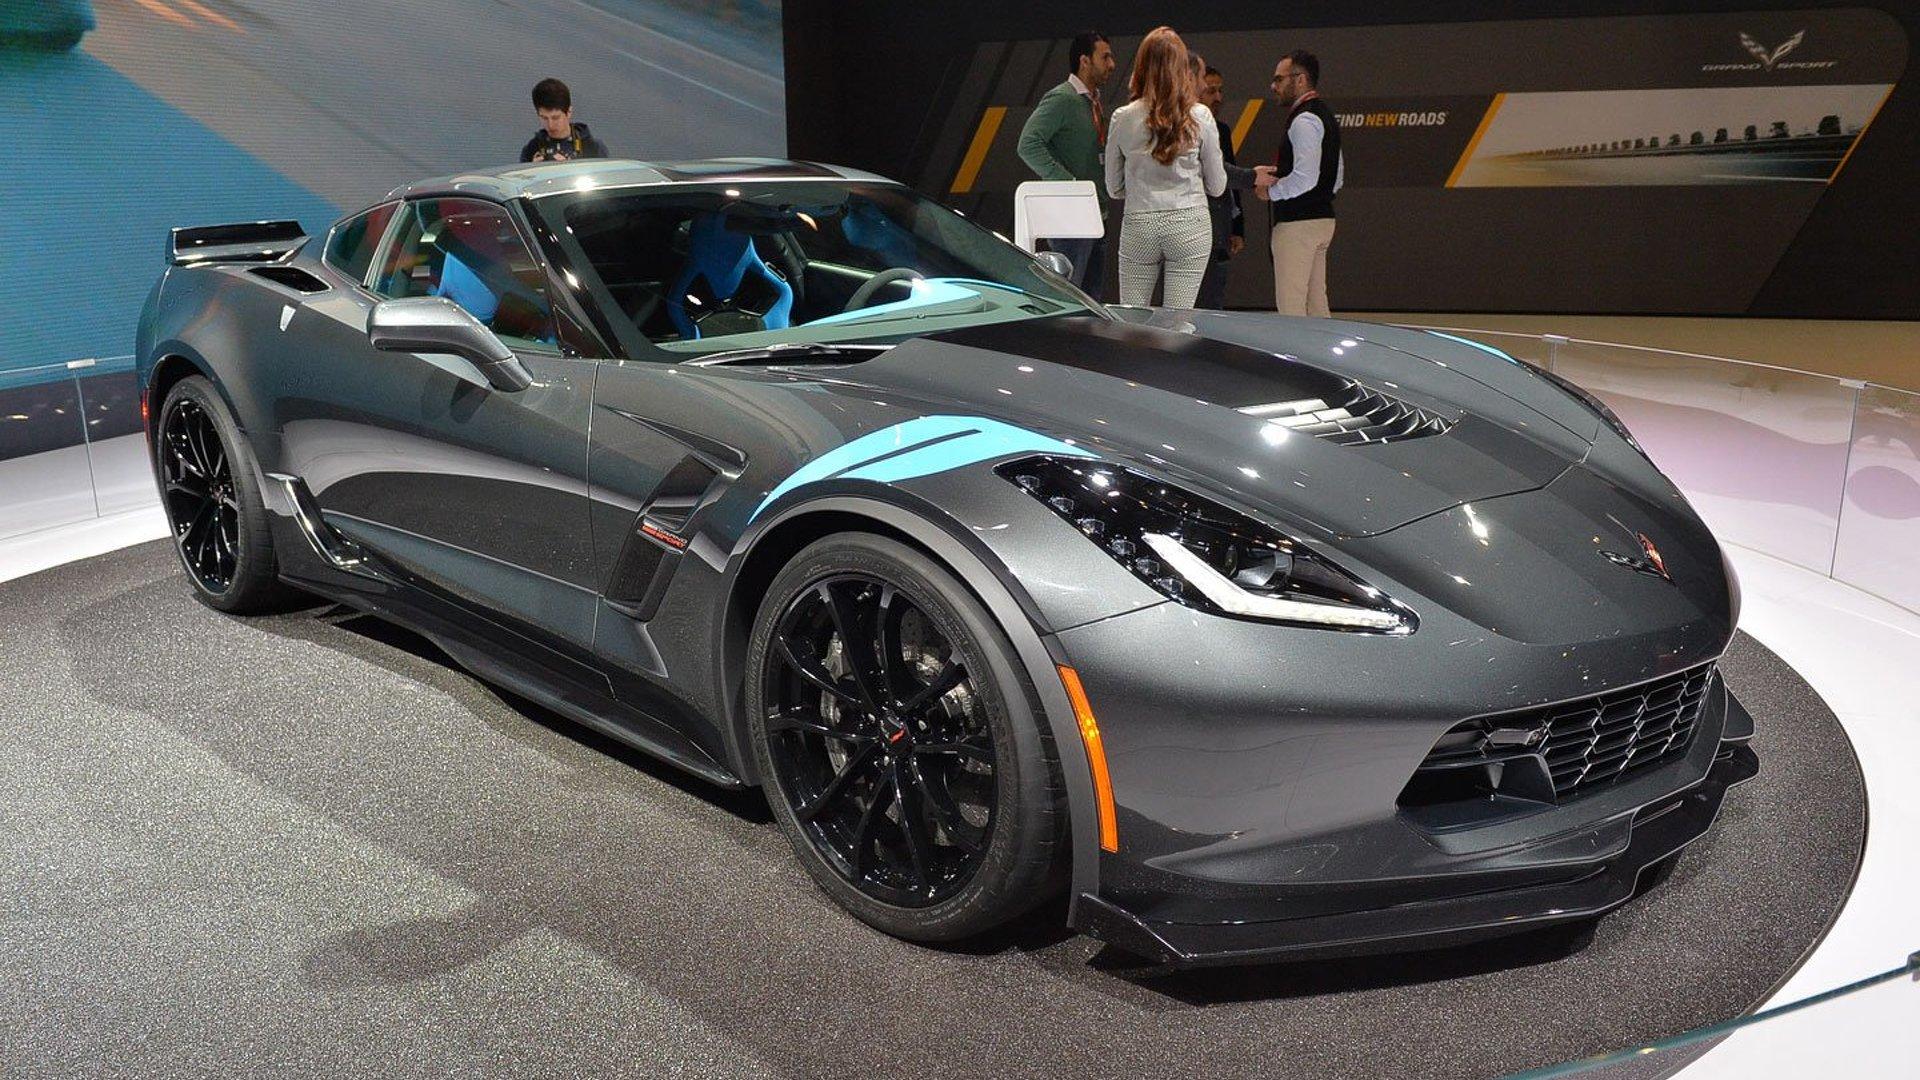 2017 corvette grand sport unveiled with 460 hp. Black Bedroom Furniture Sets. Home Design Ideas